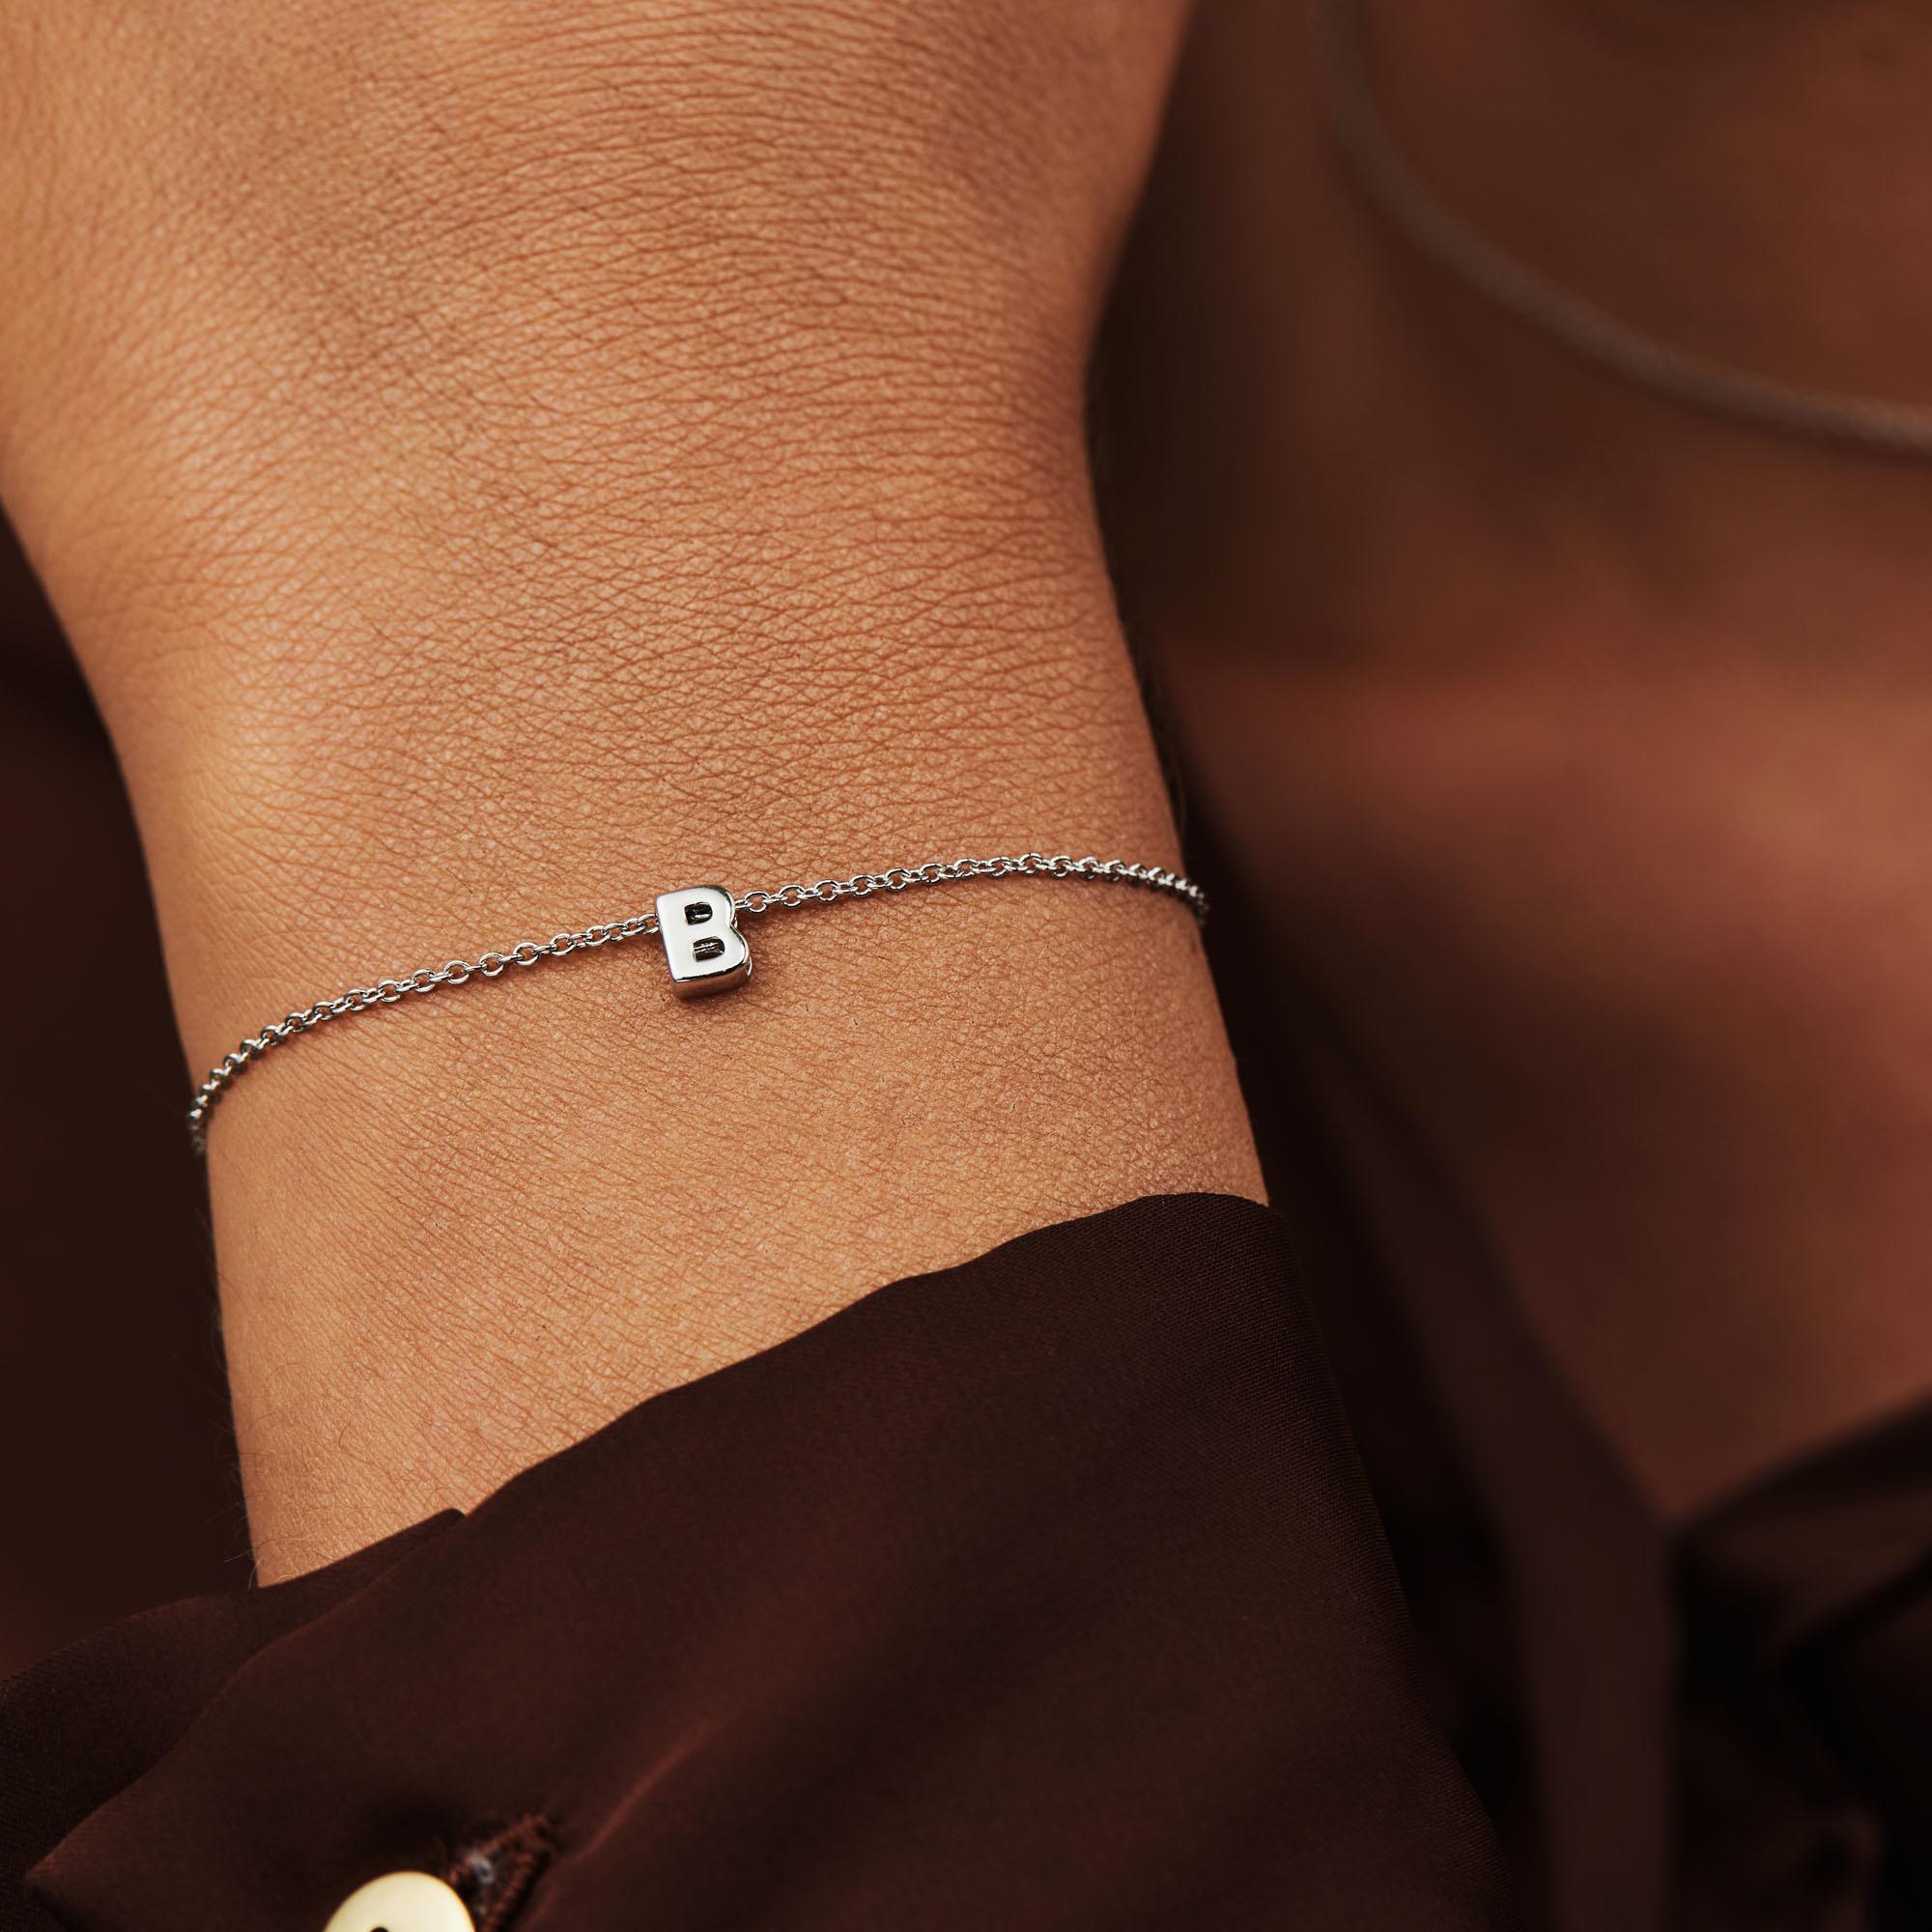 Selected Jewels Lynn Mikki 925 sterling zilveren initial armband met letter